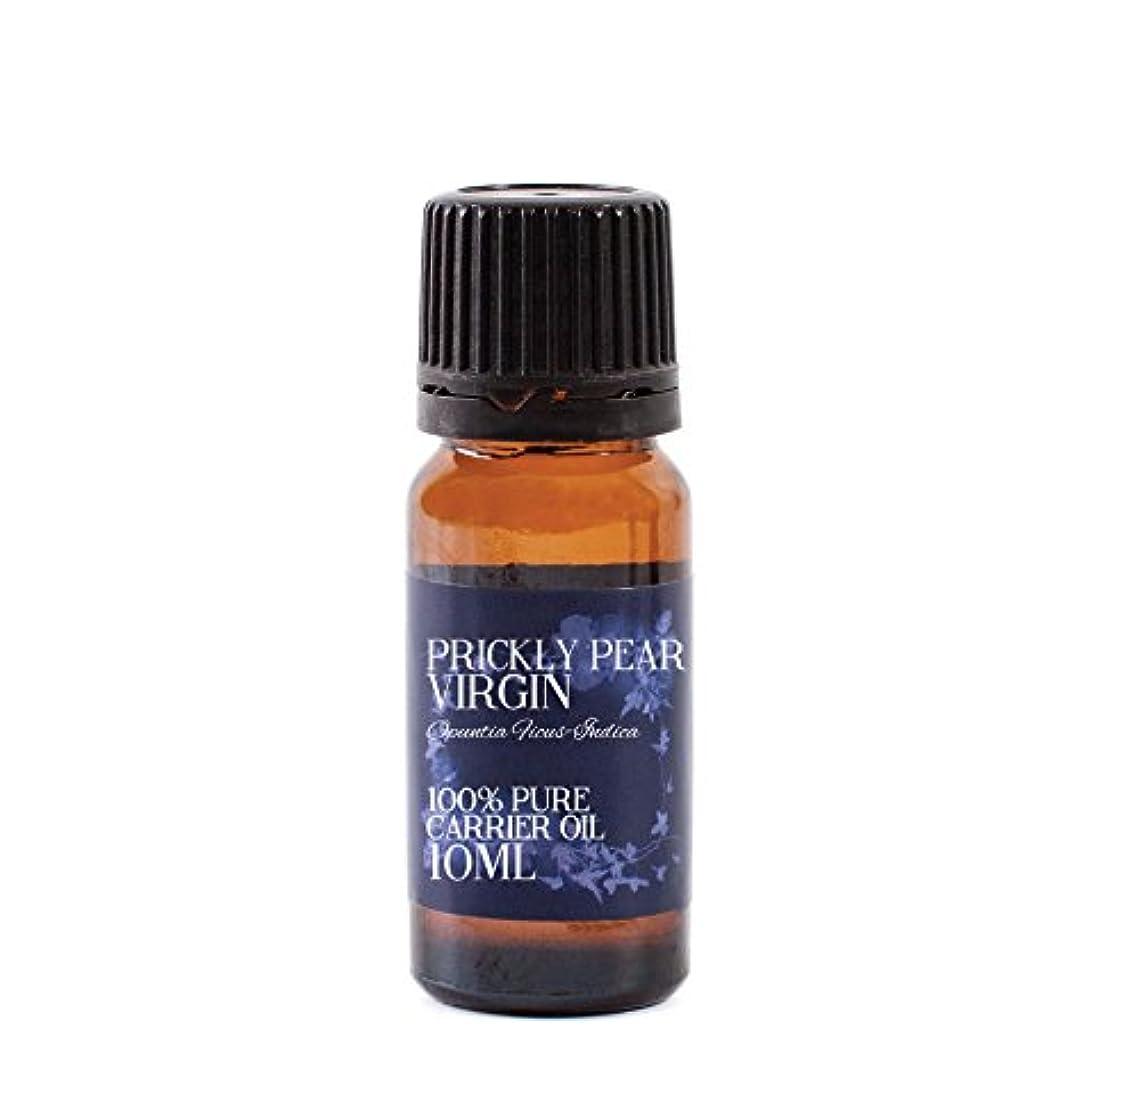 成果船形啓示Prickly Pear Virgin Carrier Oil - 100% Pure - 10ml